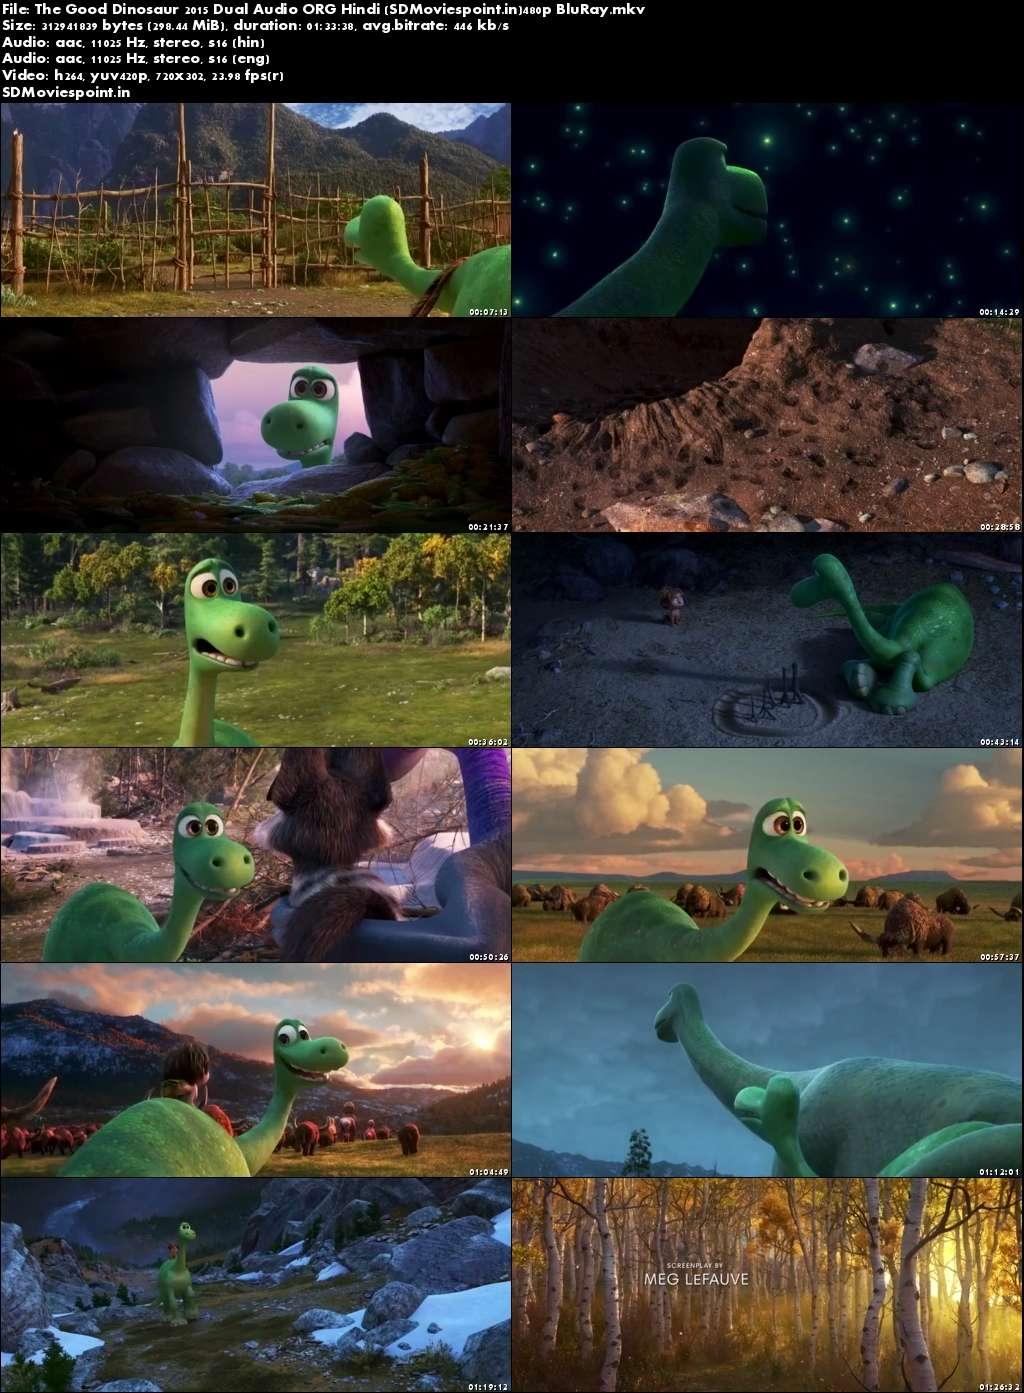 Screen Shots The Good Dinosaur (2015) Full Hindi Movie Download Dual Audio